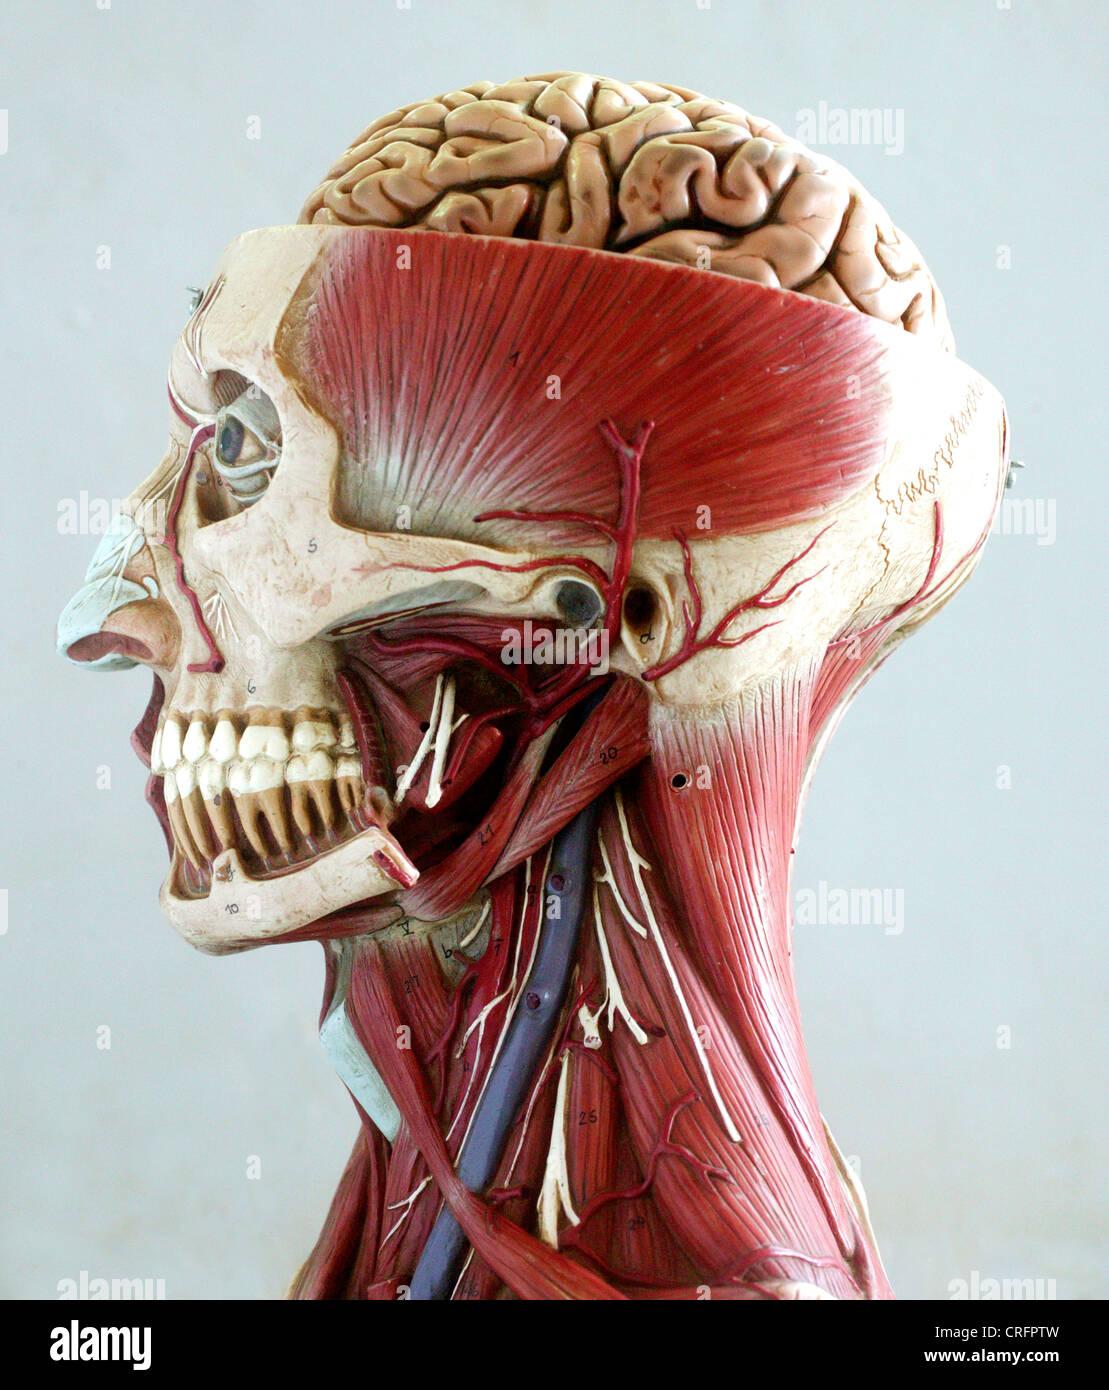 Academic Anatomy Brain Central Nervous System Stock Photo: 48905049 ...